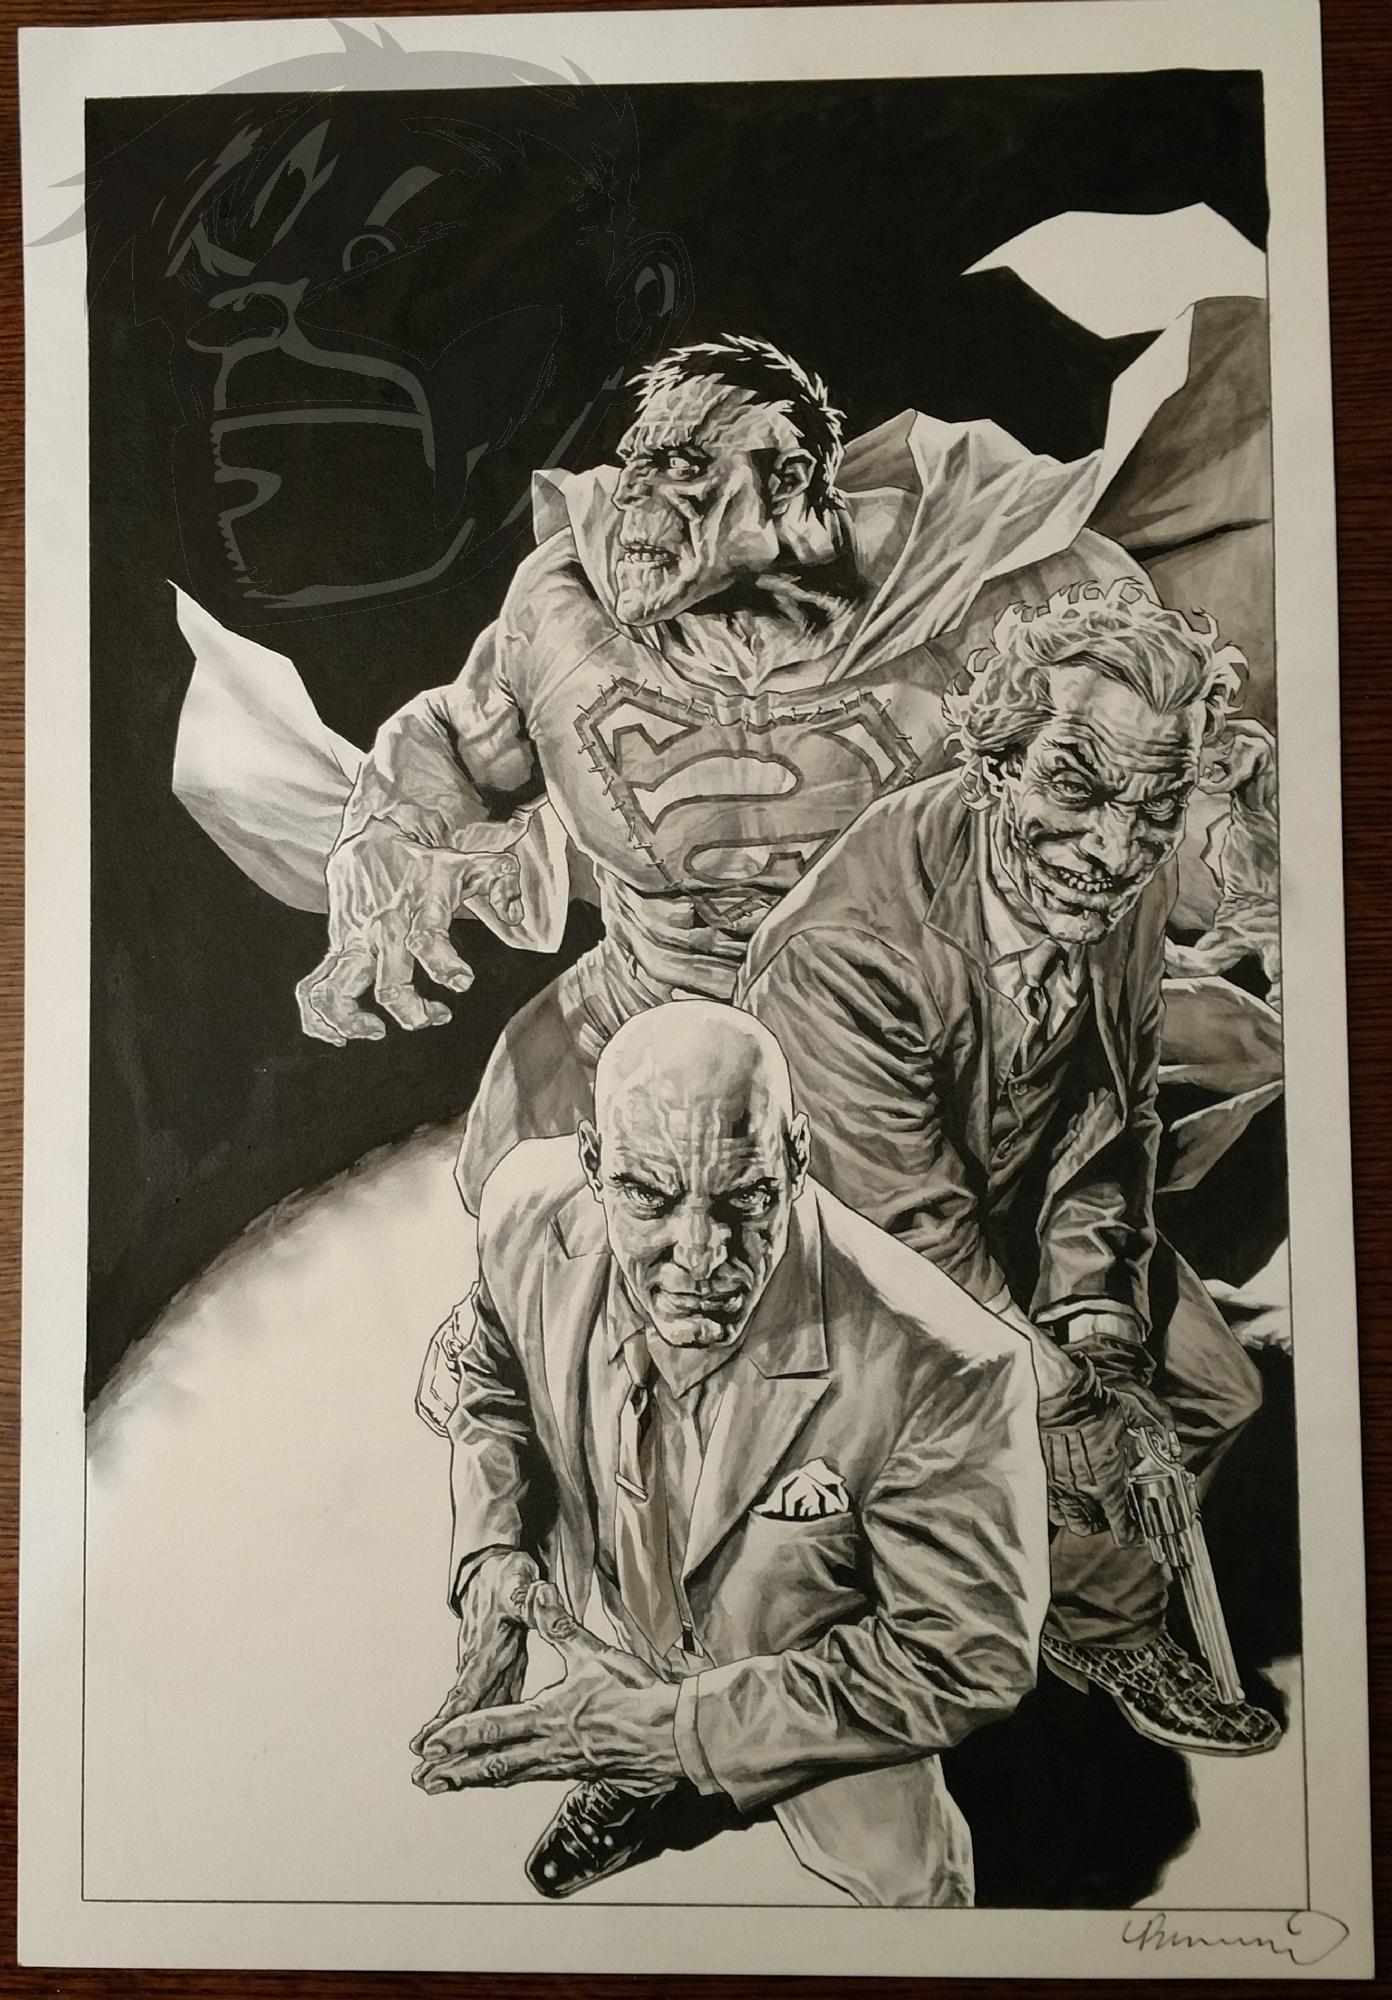 Wizard Cover art by Lee Bermejo - Batman and Superman villains Joker, Lex Luthor, and Bizarro Comic Art